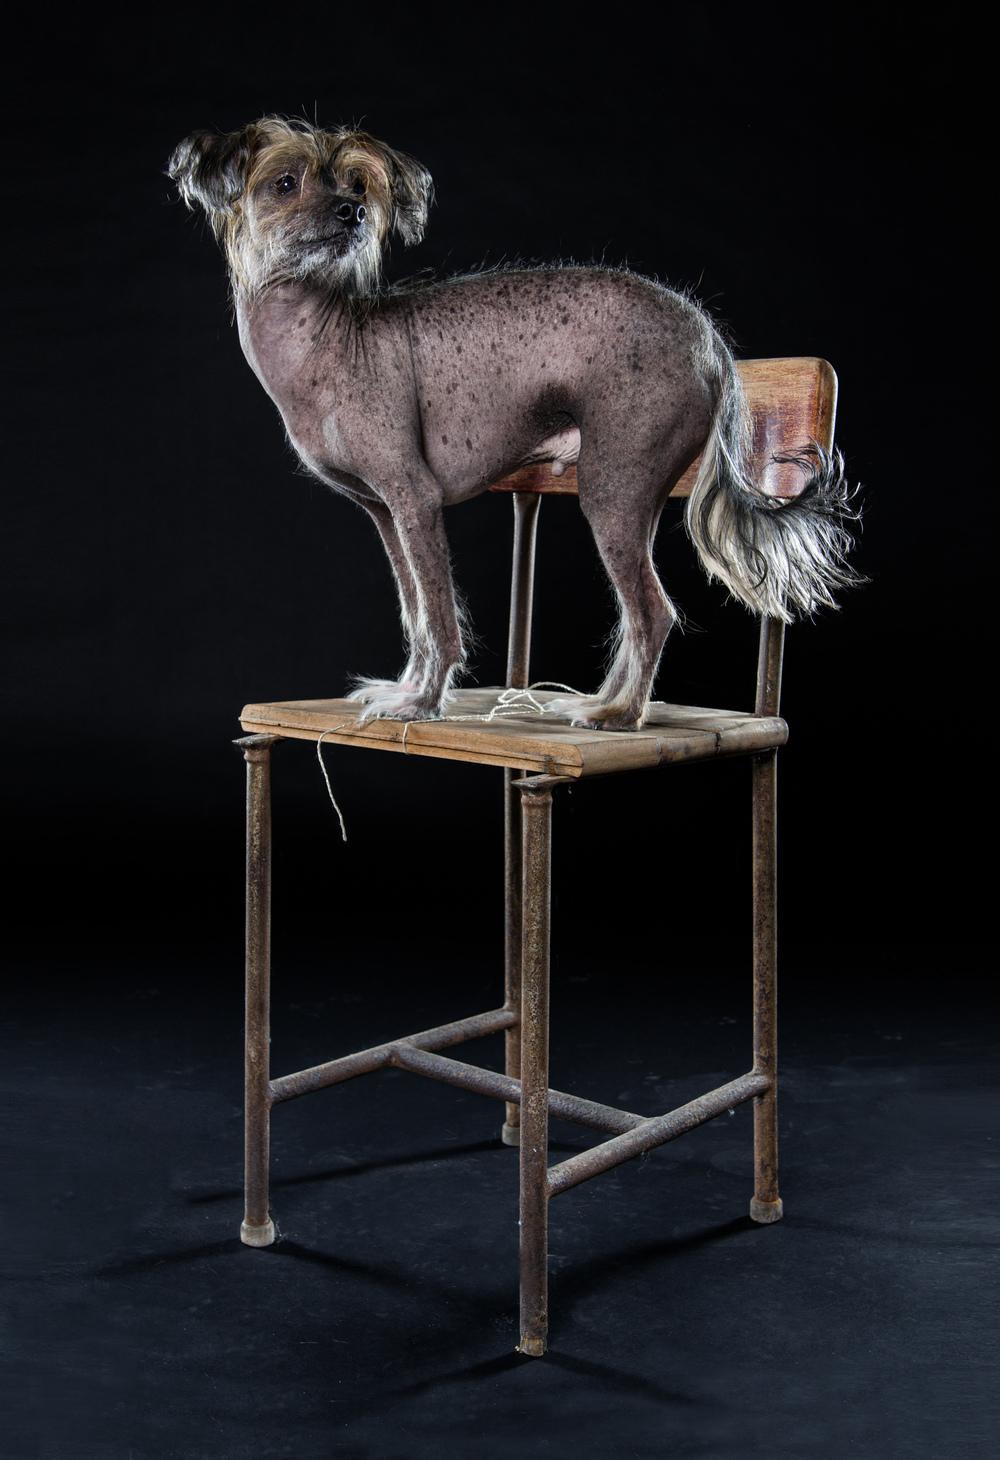 naked-dogs-klausdyba-2.jpg